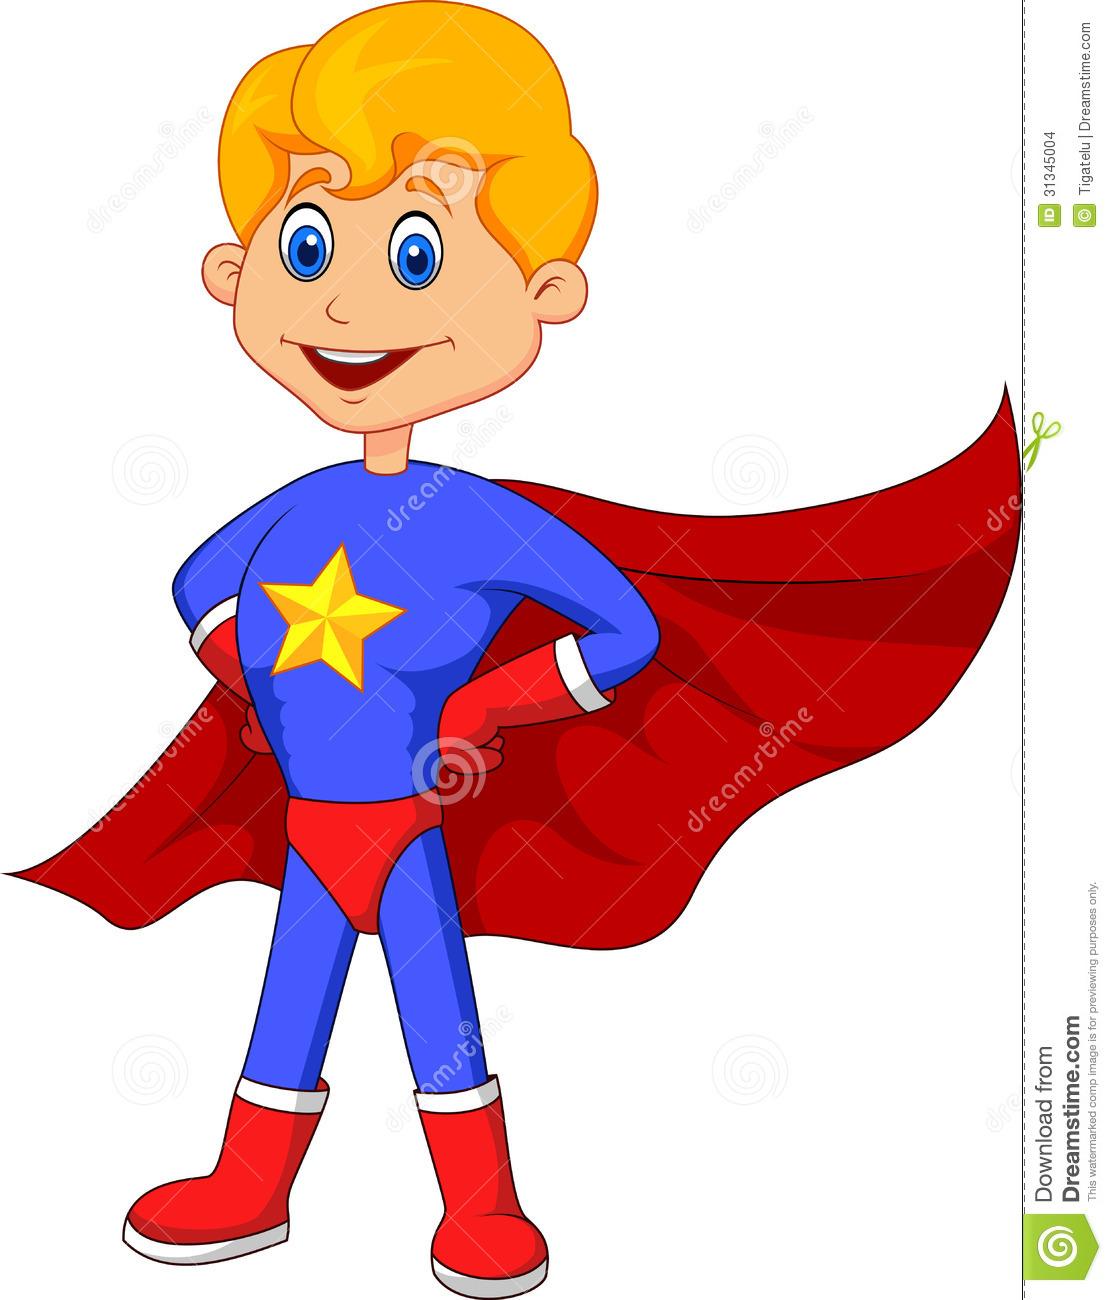 Flash superhero clipart free download best flash - Super hero flash ...